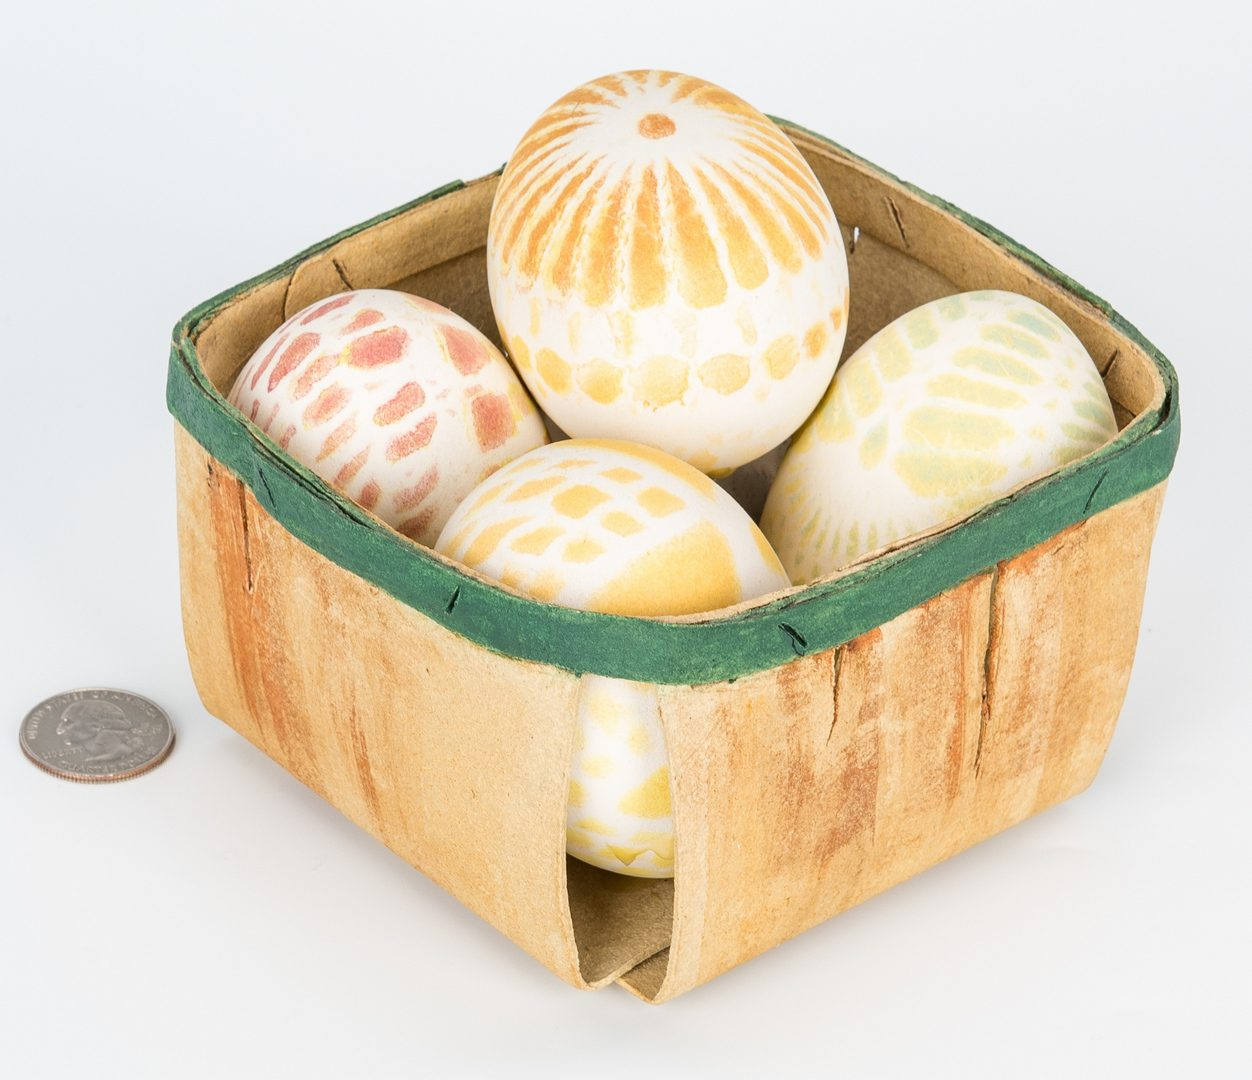 Lot 557: Sylvia Hyman Egg Basket tromp d'oeil sculpture